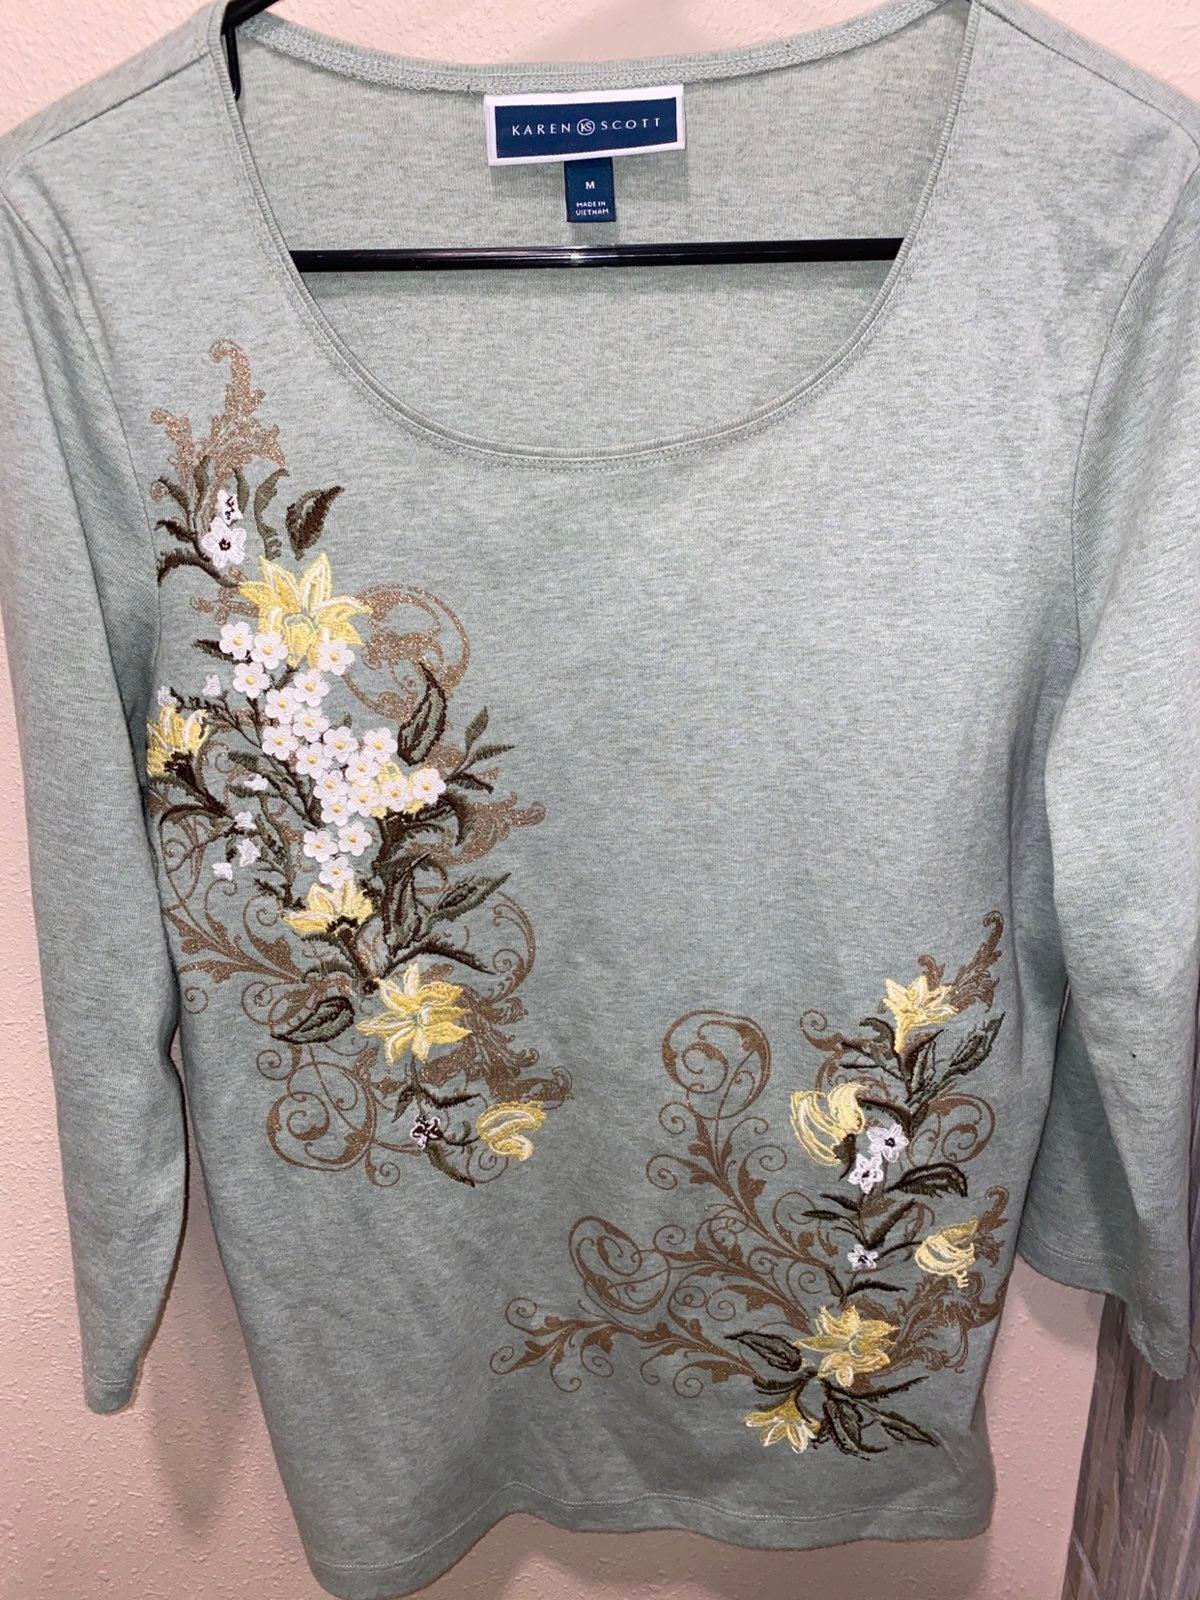 Sz M Karen Scott Floral-Embroidered Top